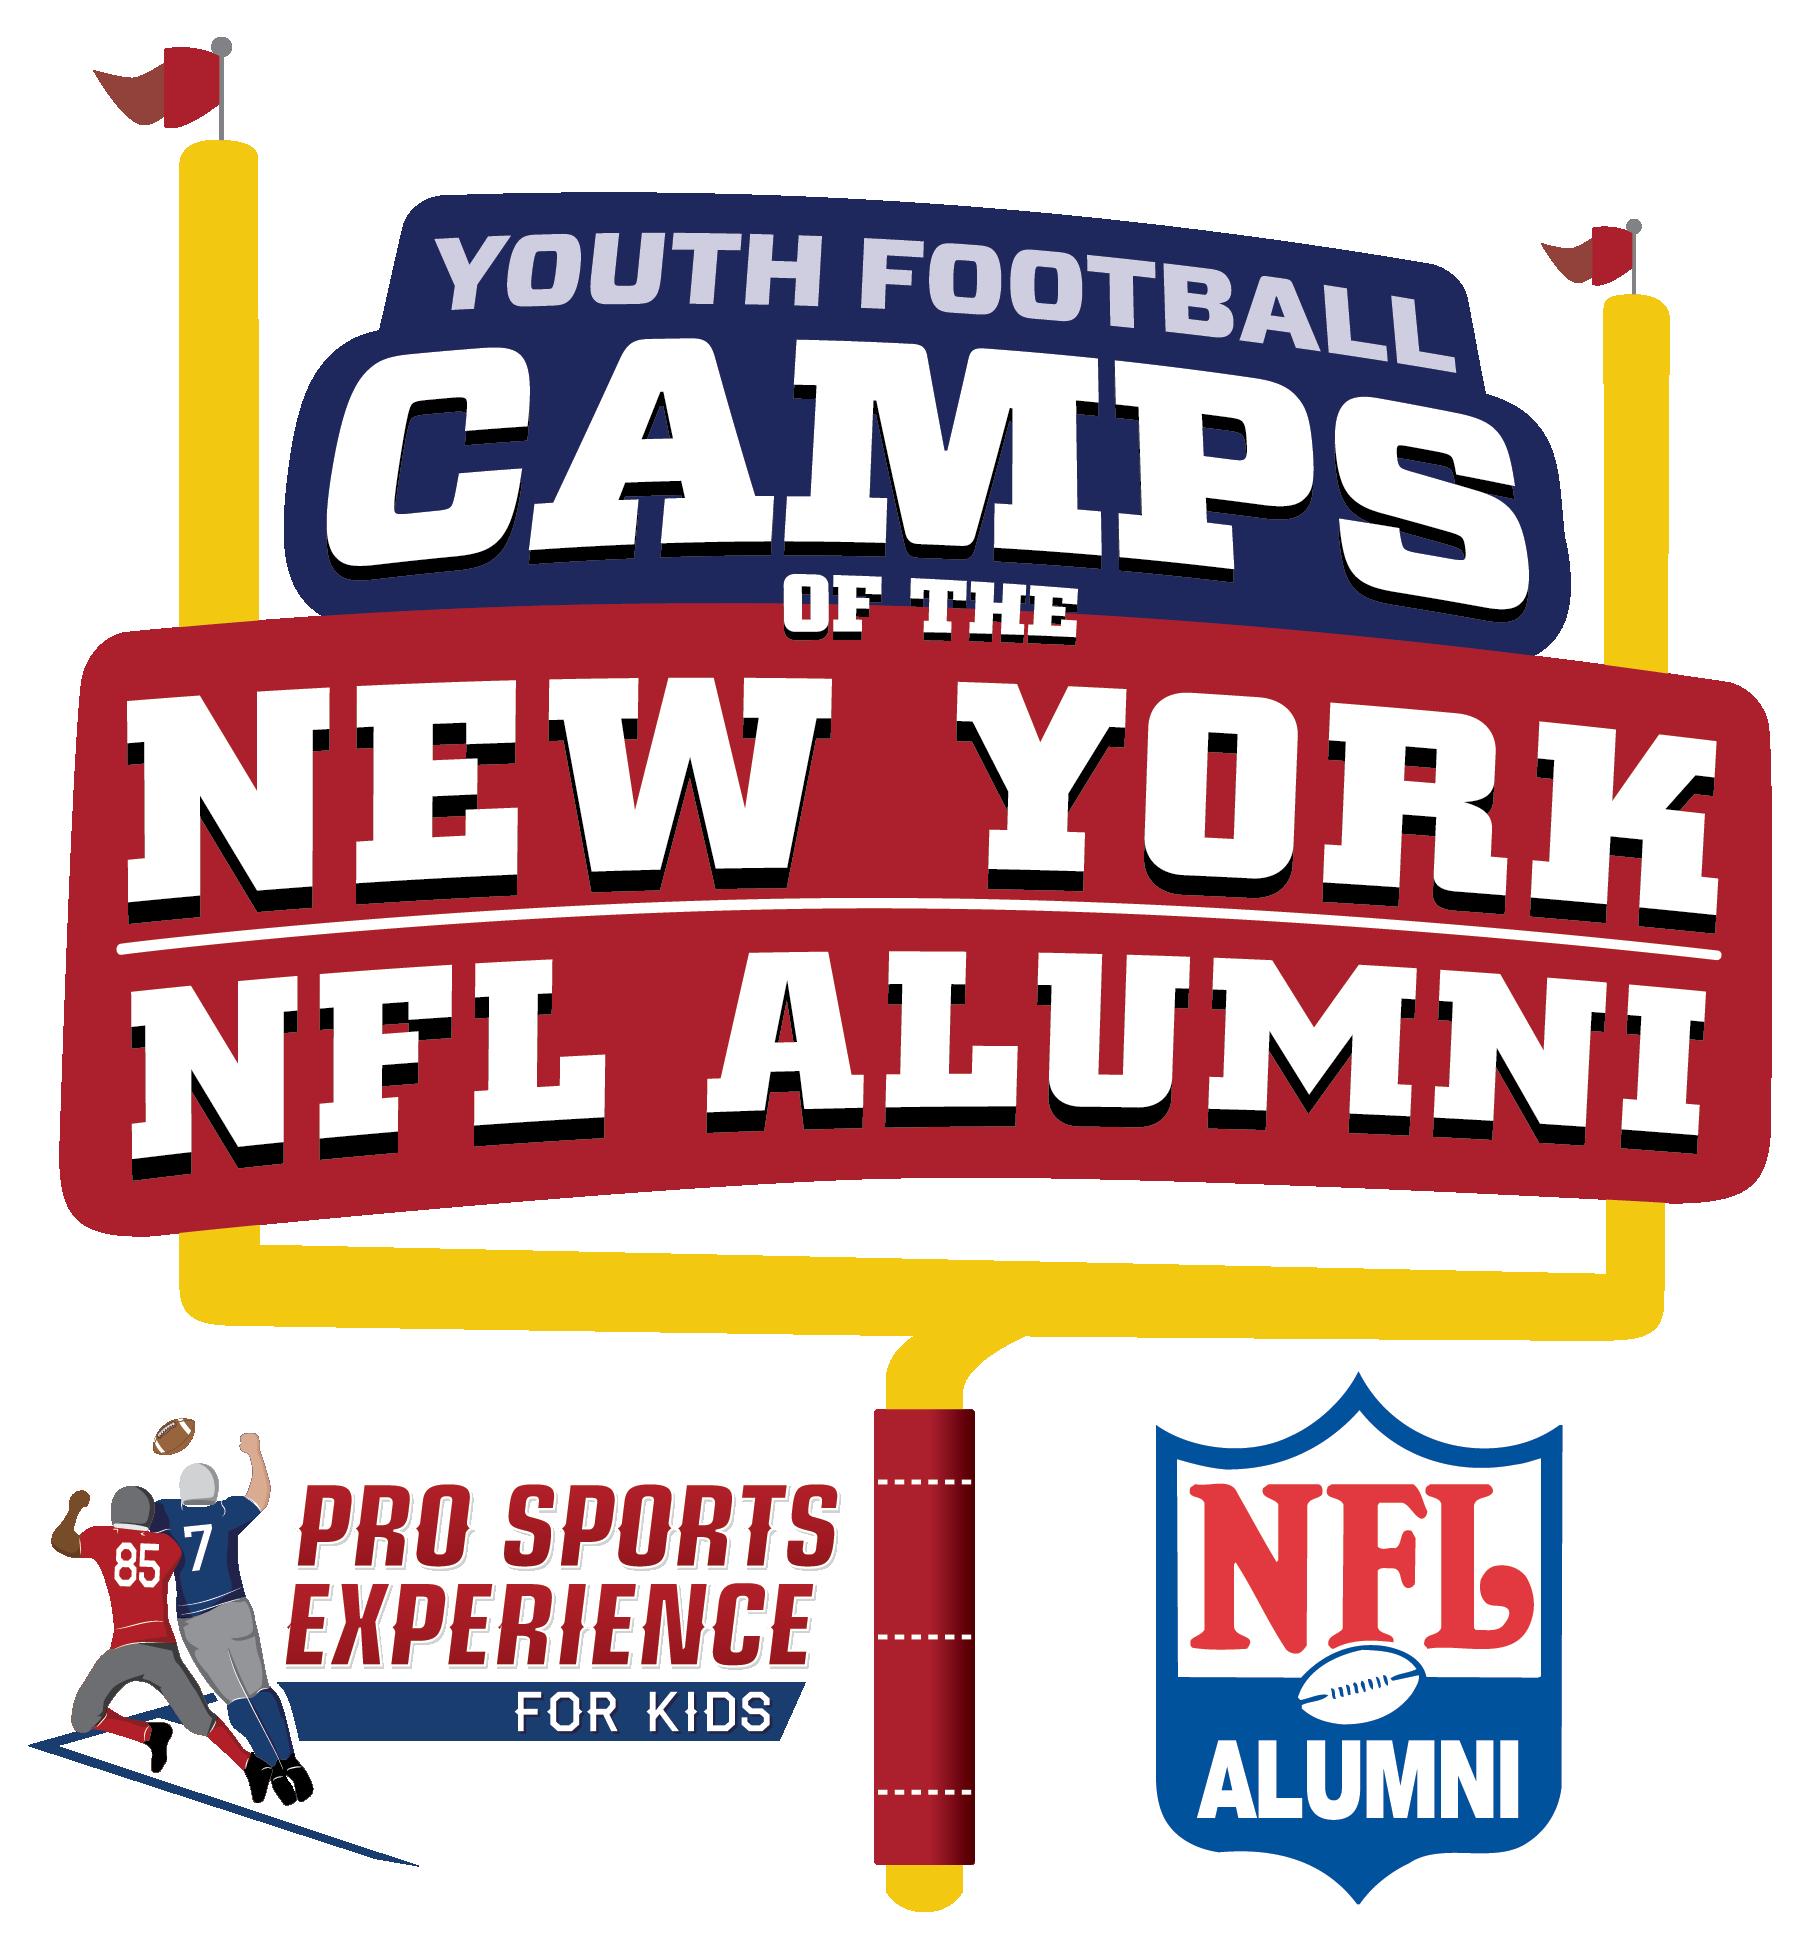 New York NFL Alumni Hero Youth Football Camps - Montclair